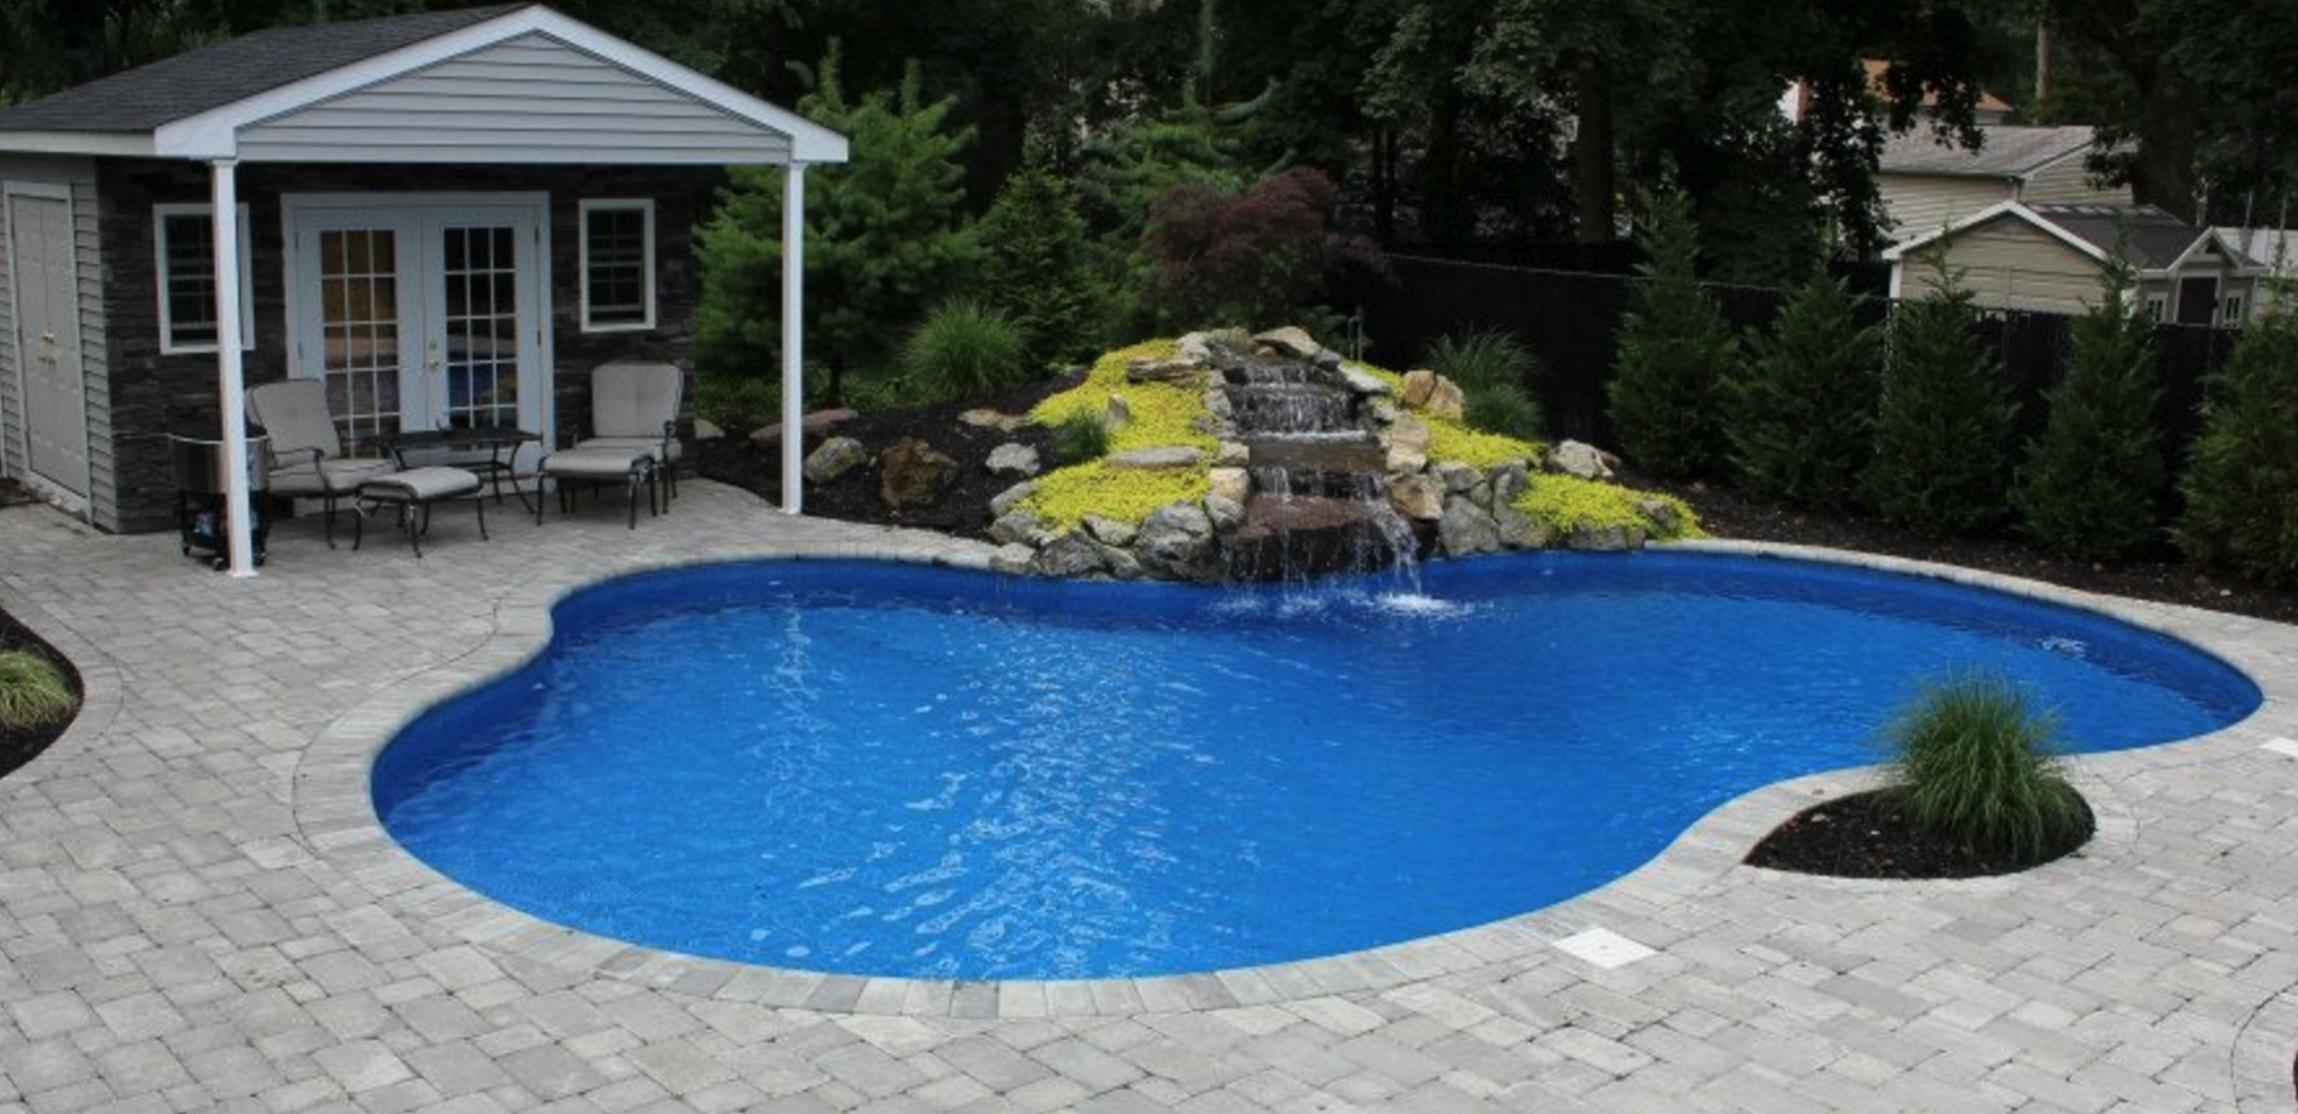 Vinyl liner swimming pool, inground pool Long Island, NY Huntington, NY pool builder